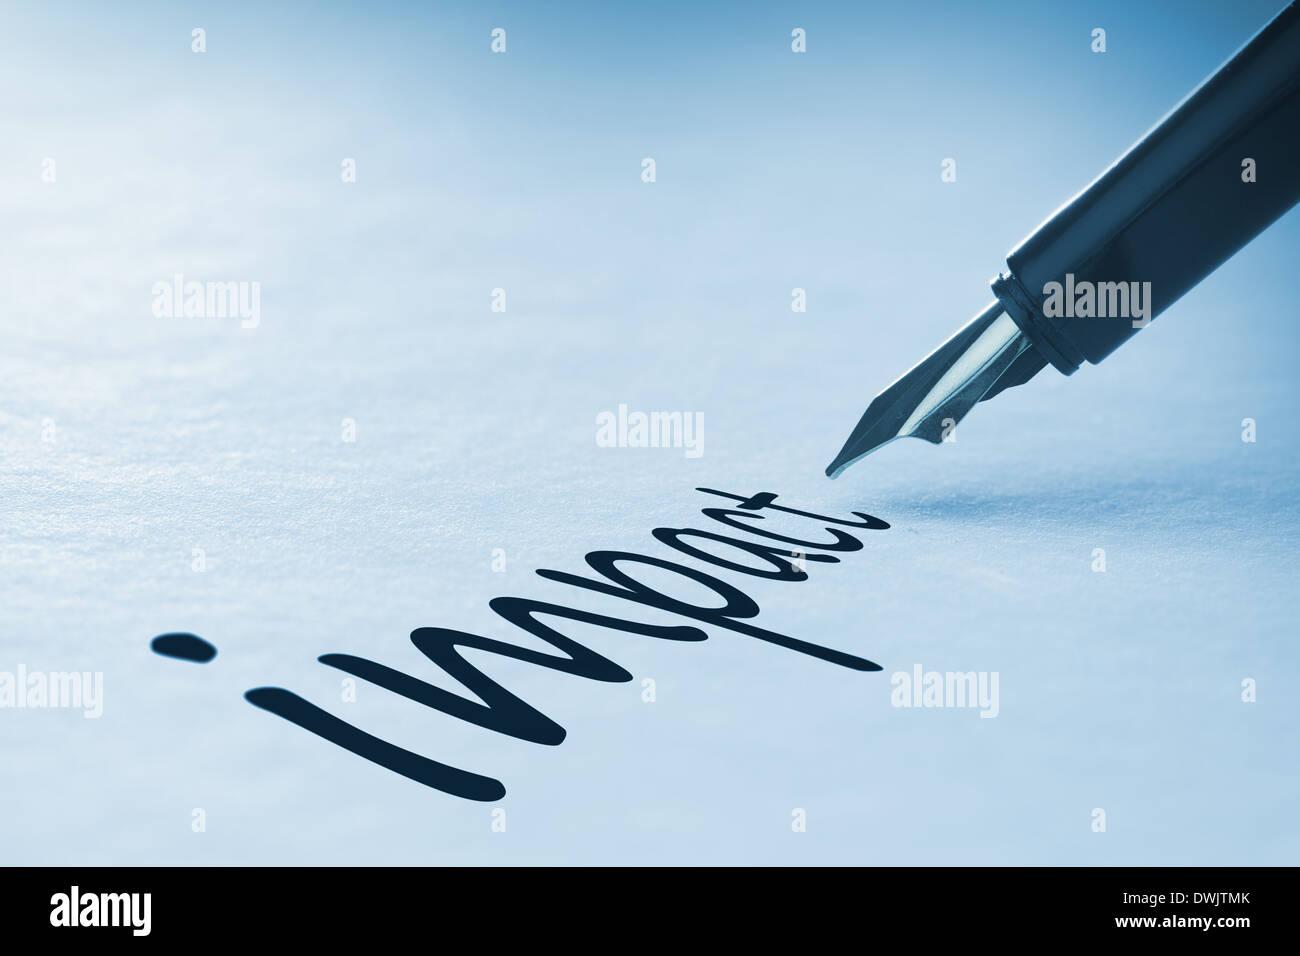 Fountain pen writing Impact - Stock Image